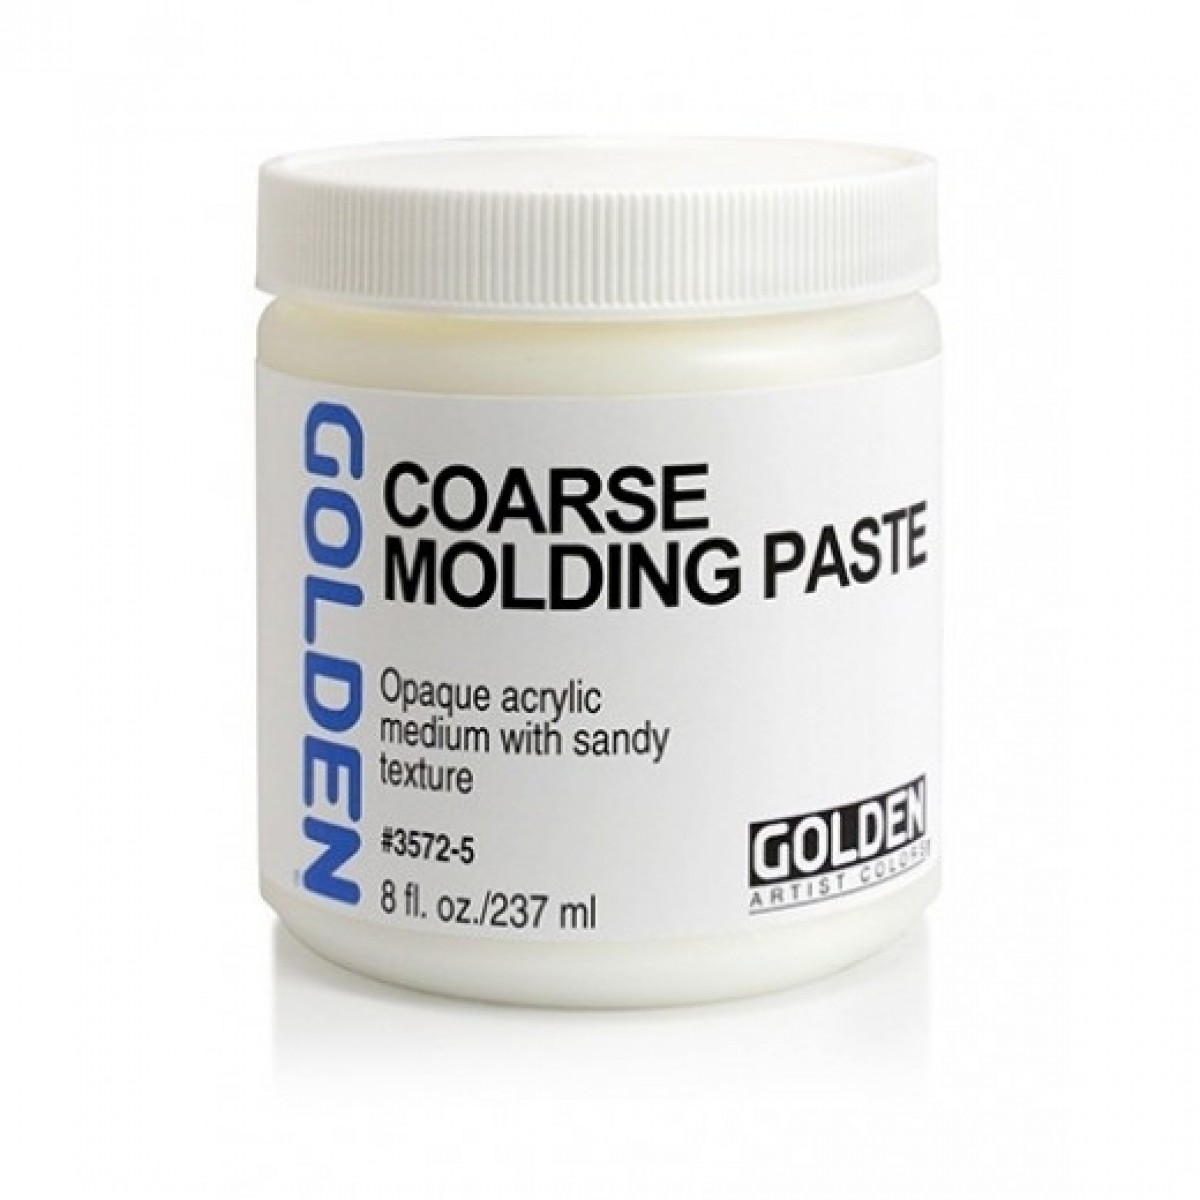 GOLDEN Coarse Molding Paste, 237 ml